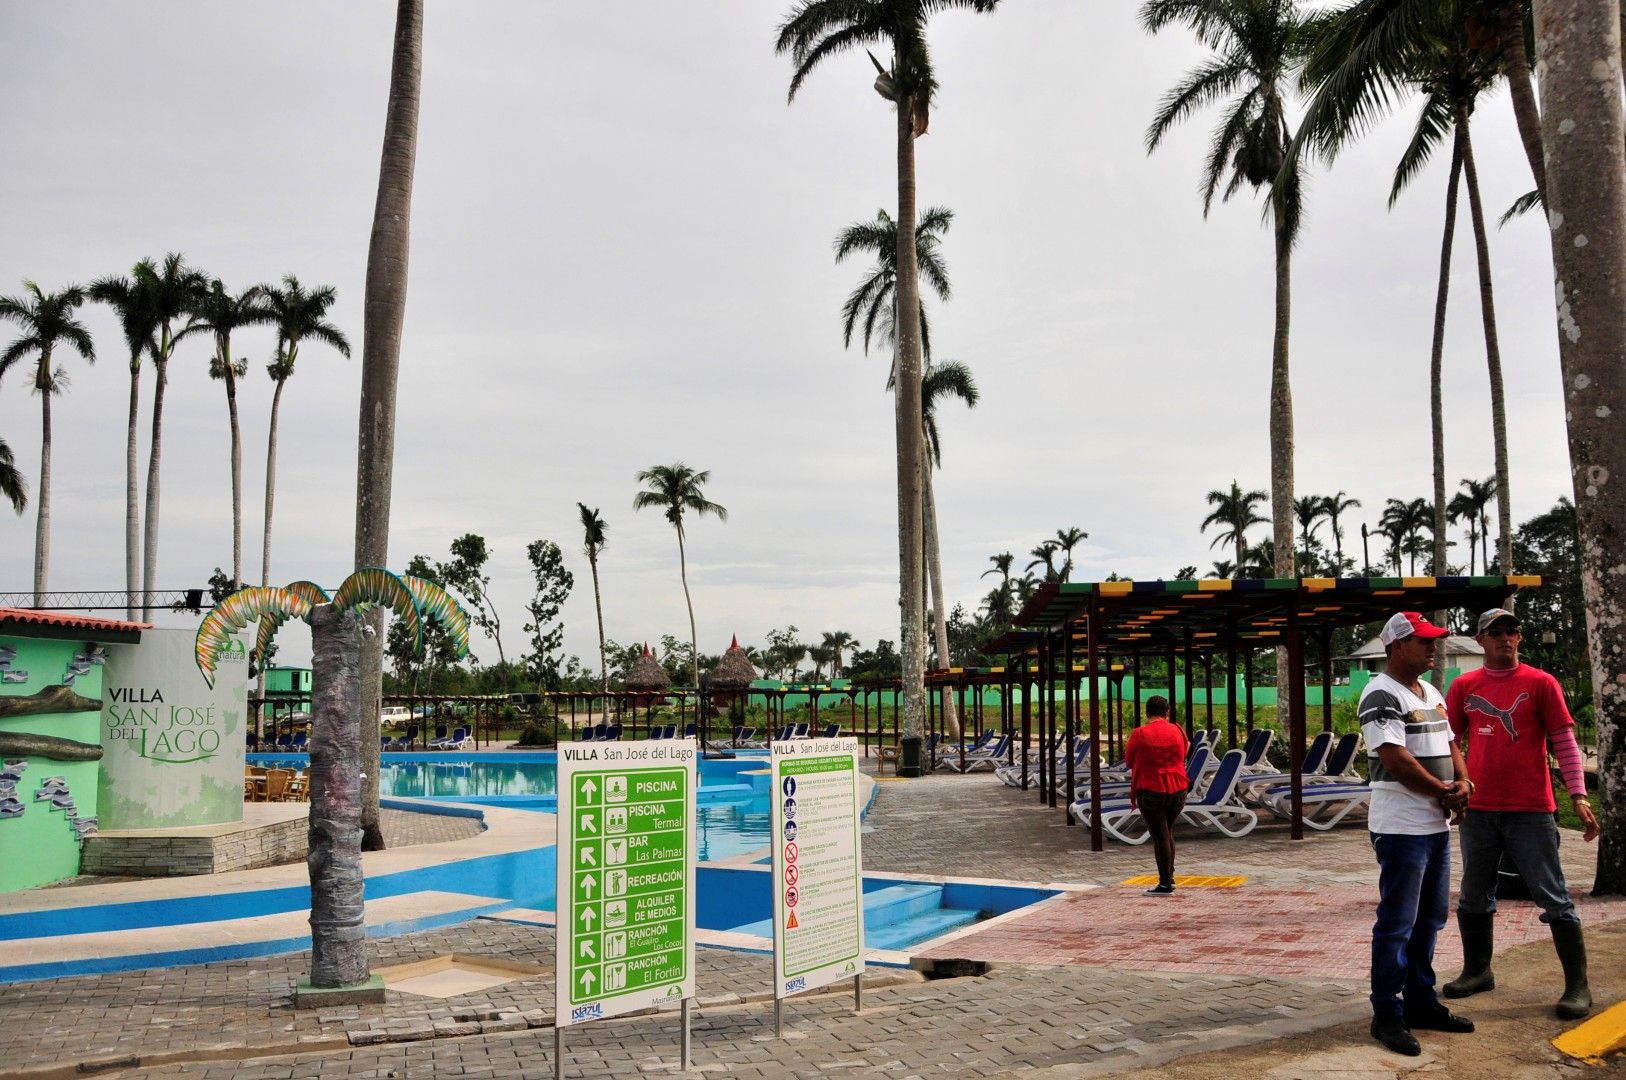 sancti spiritus, lagos de mayajigua, villa san jose del lago, turismo, cadena islazul, huracan irma